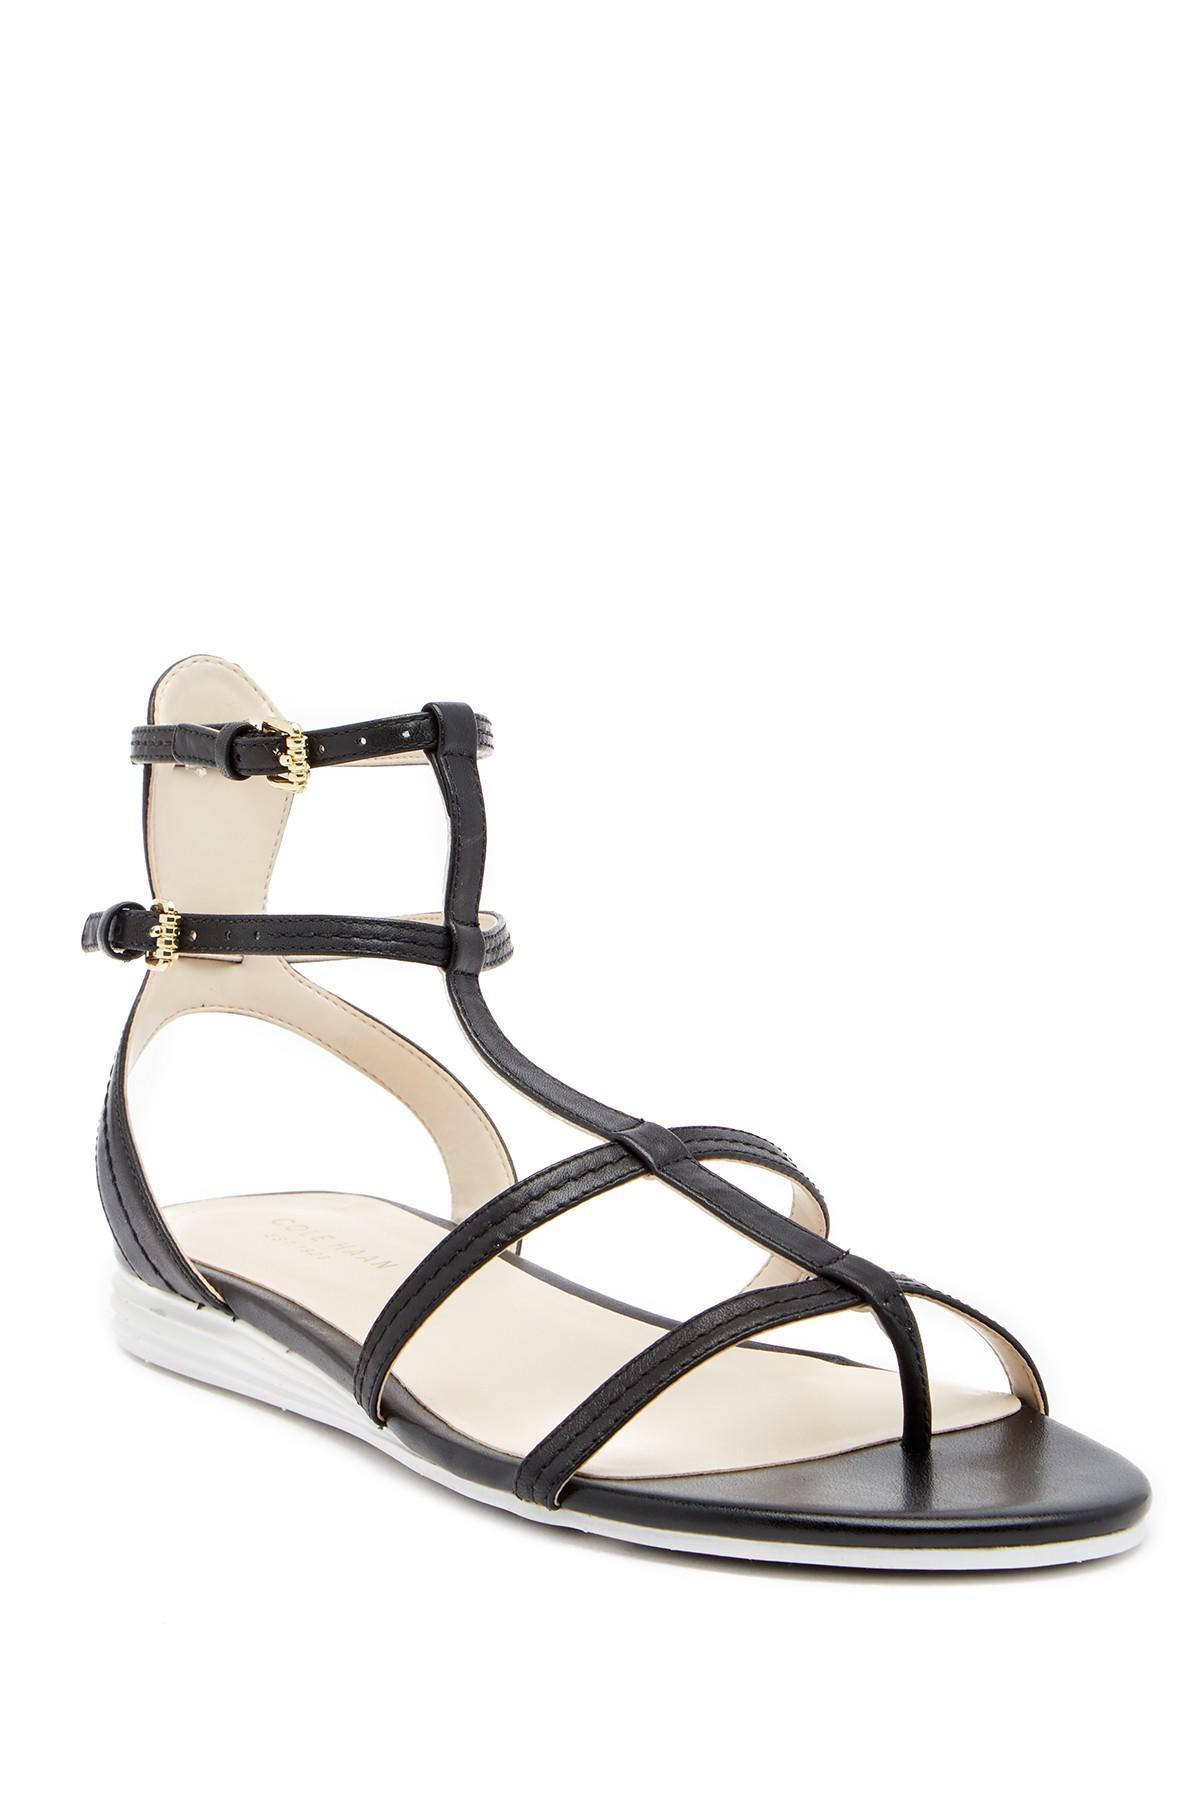 dadbbec59ac Lyst - Cole Haan Original Grand Gladiator Sandal in Black